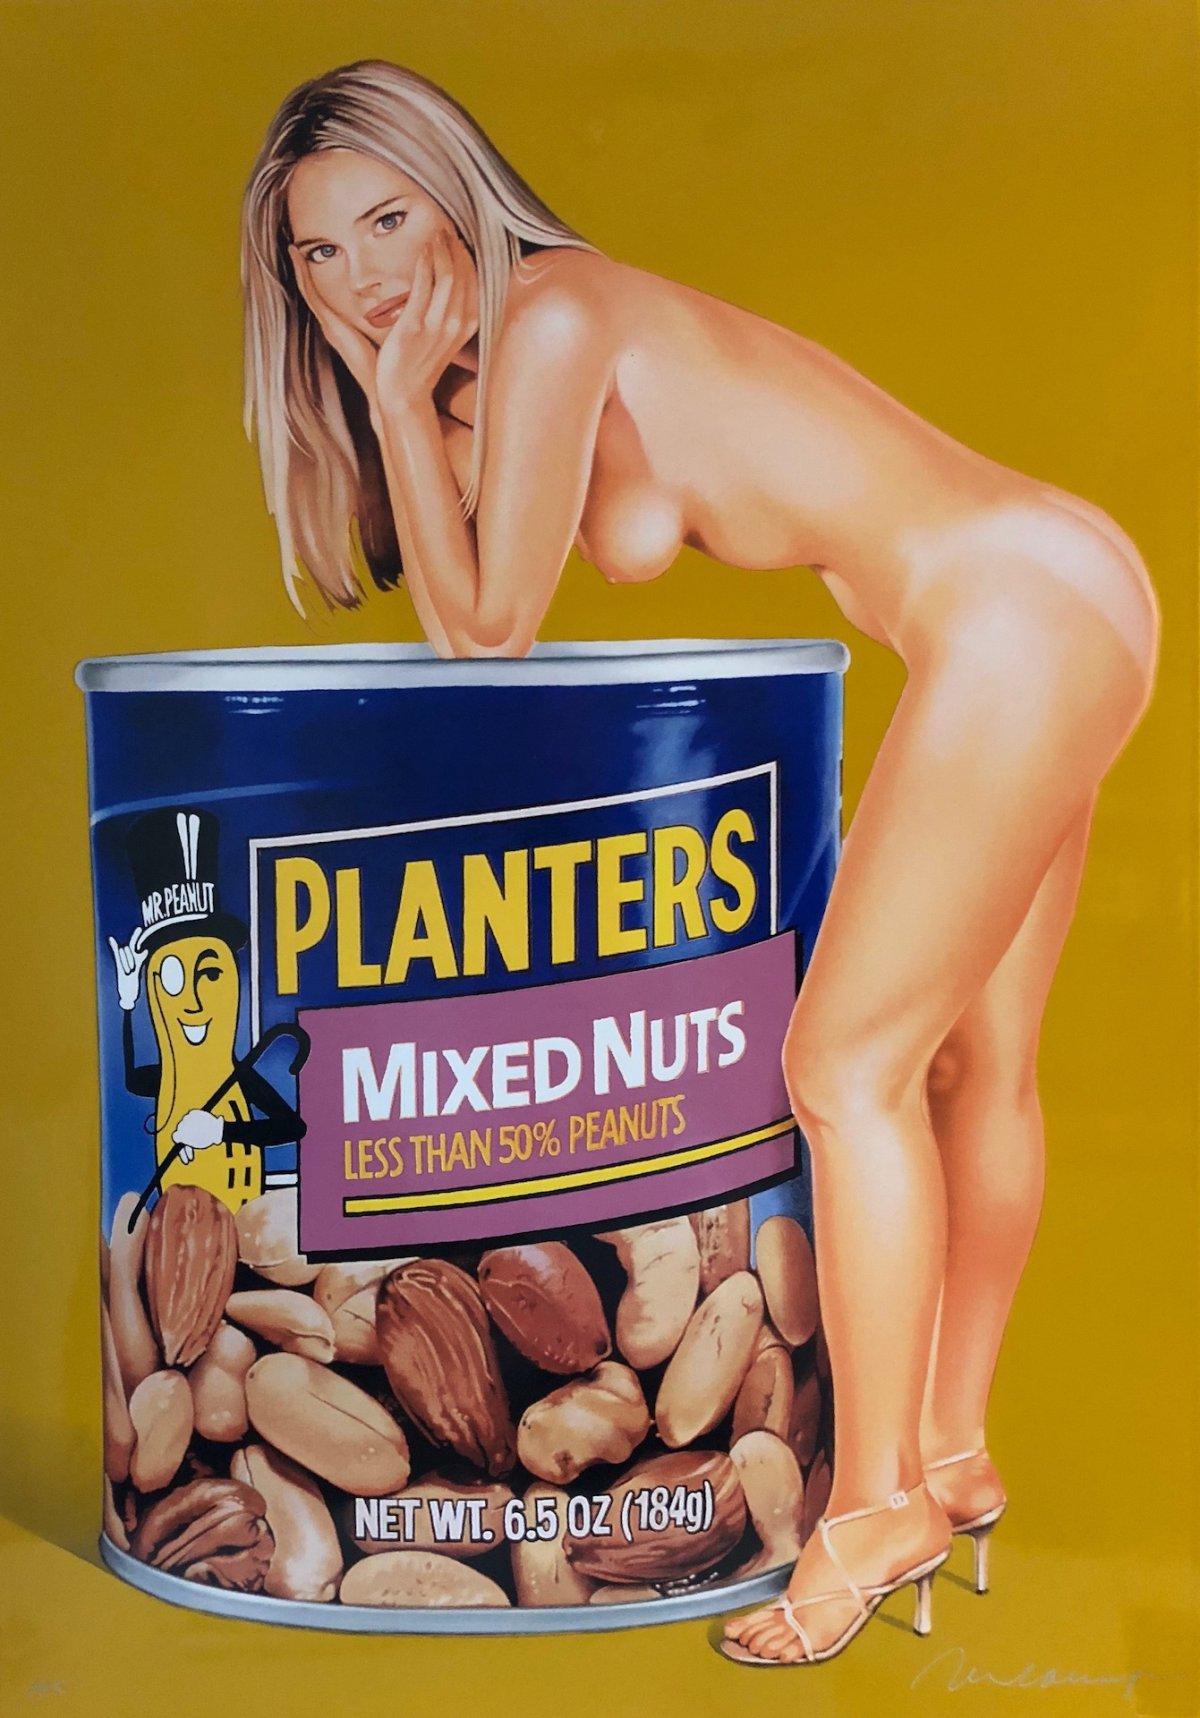 melramos-mel-ramos-mixednuts-popstreetshop